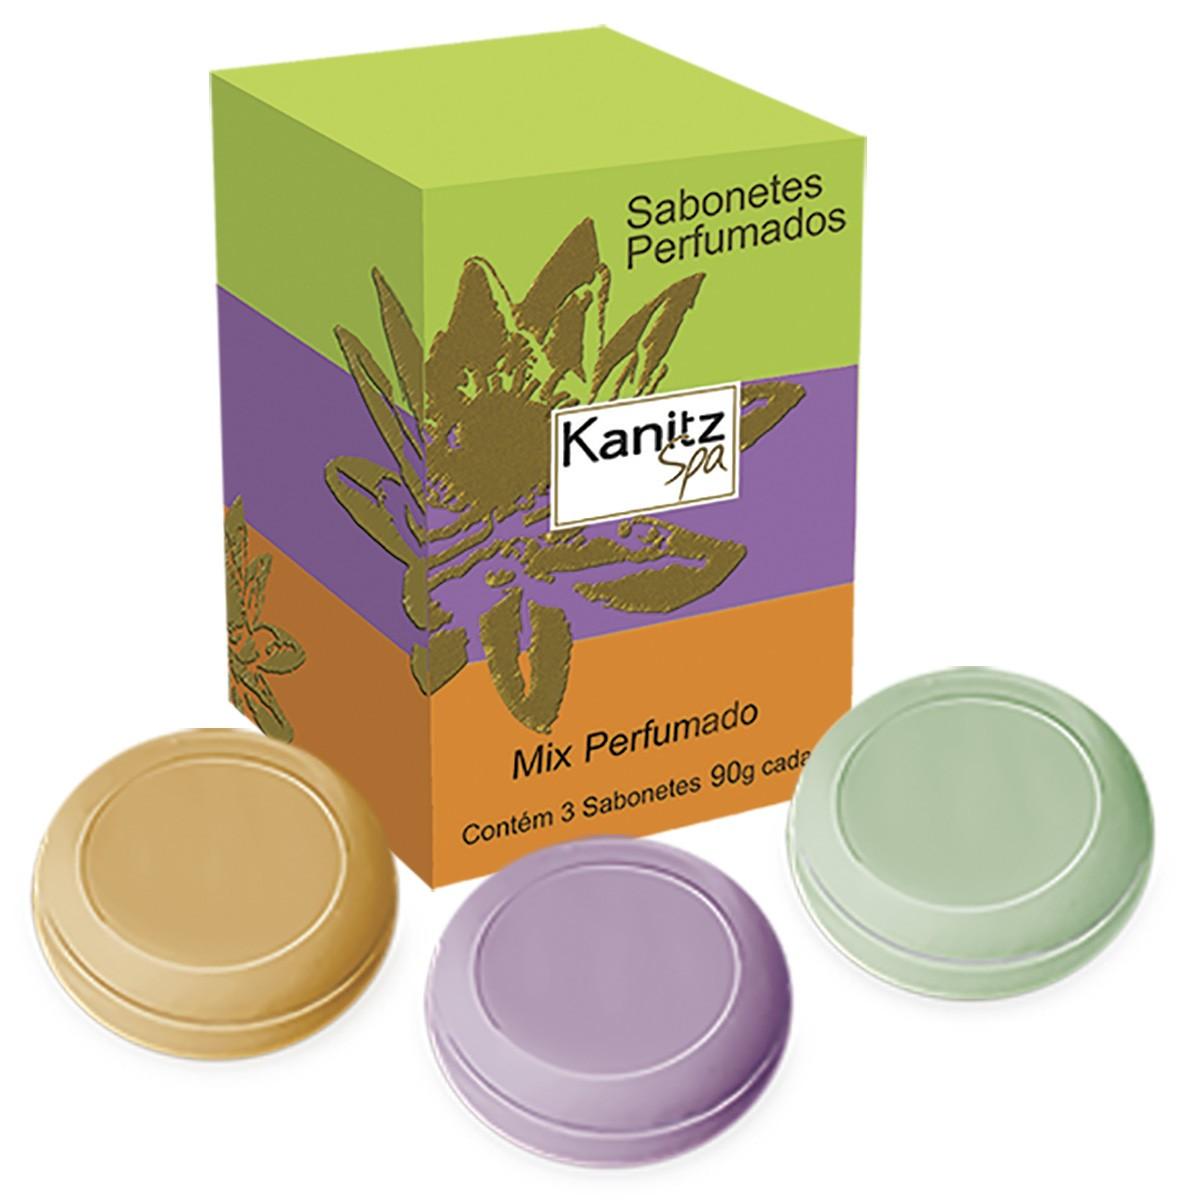 Sabonete Mix Perfumado Kanitz SPA 3x90g